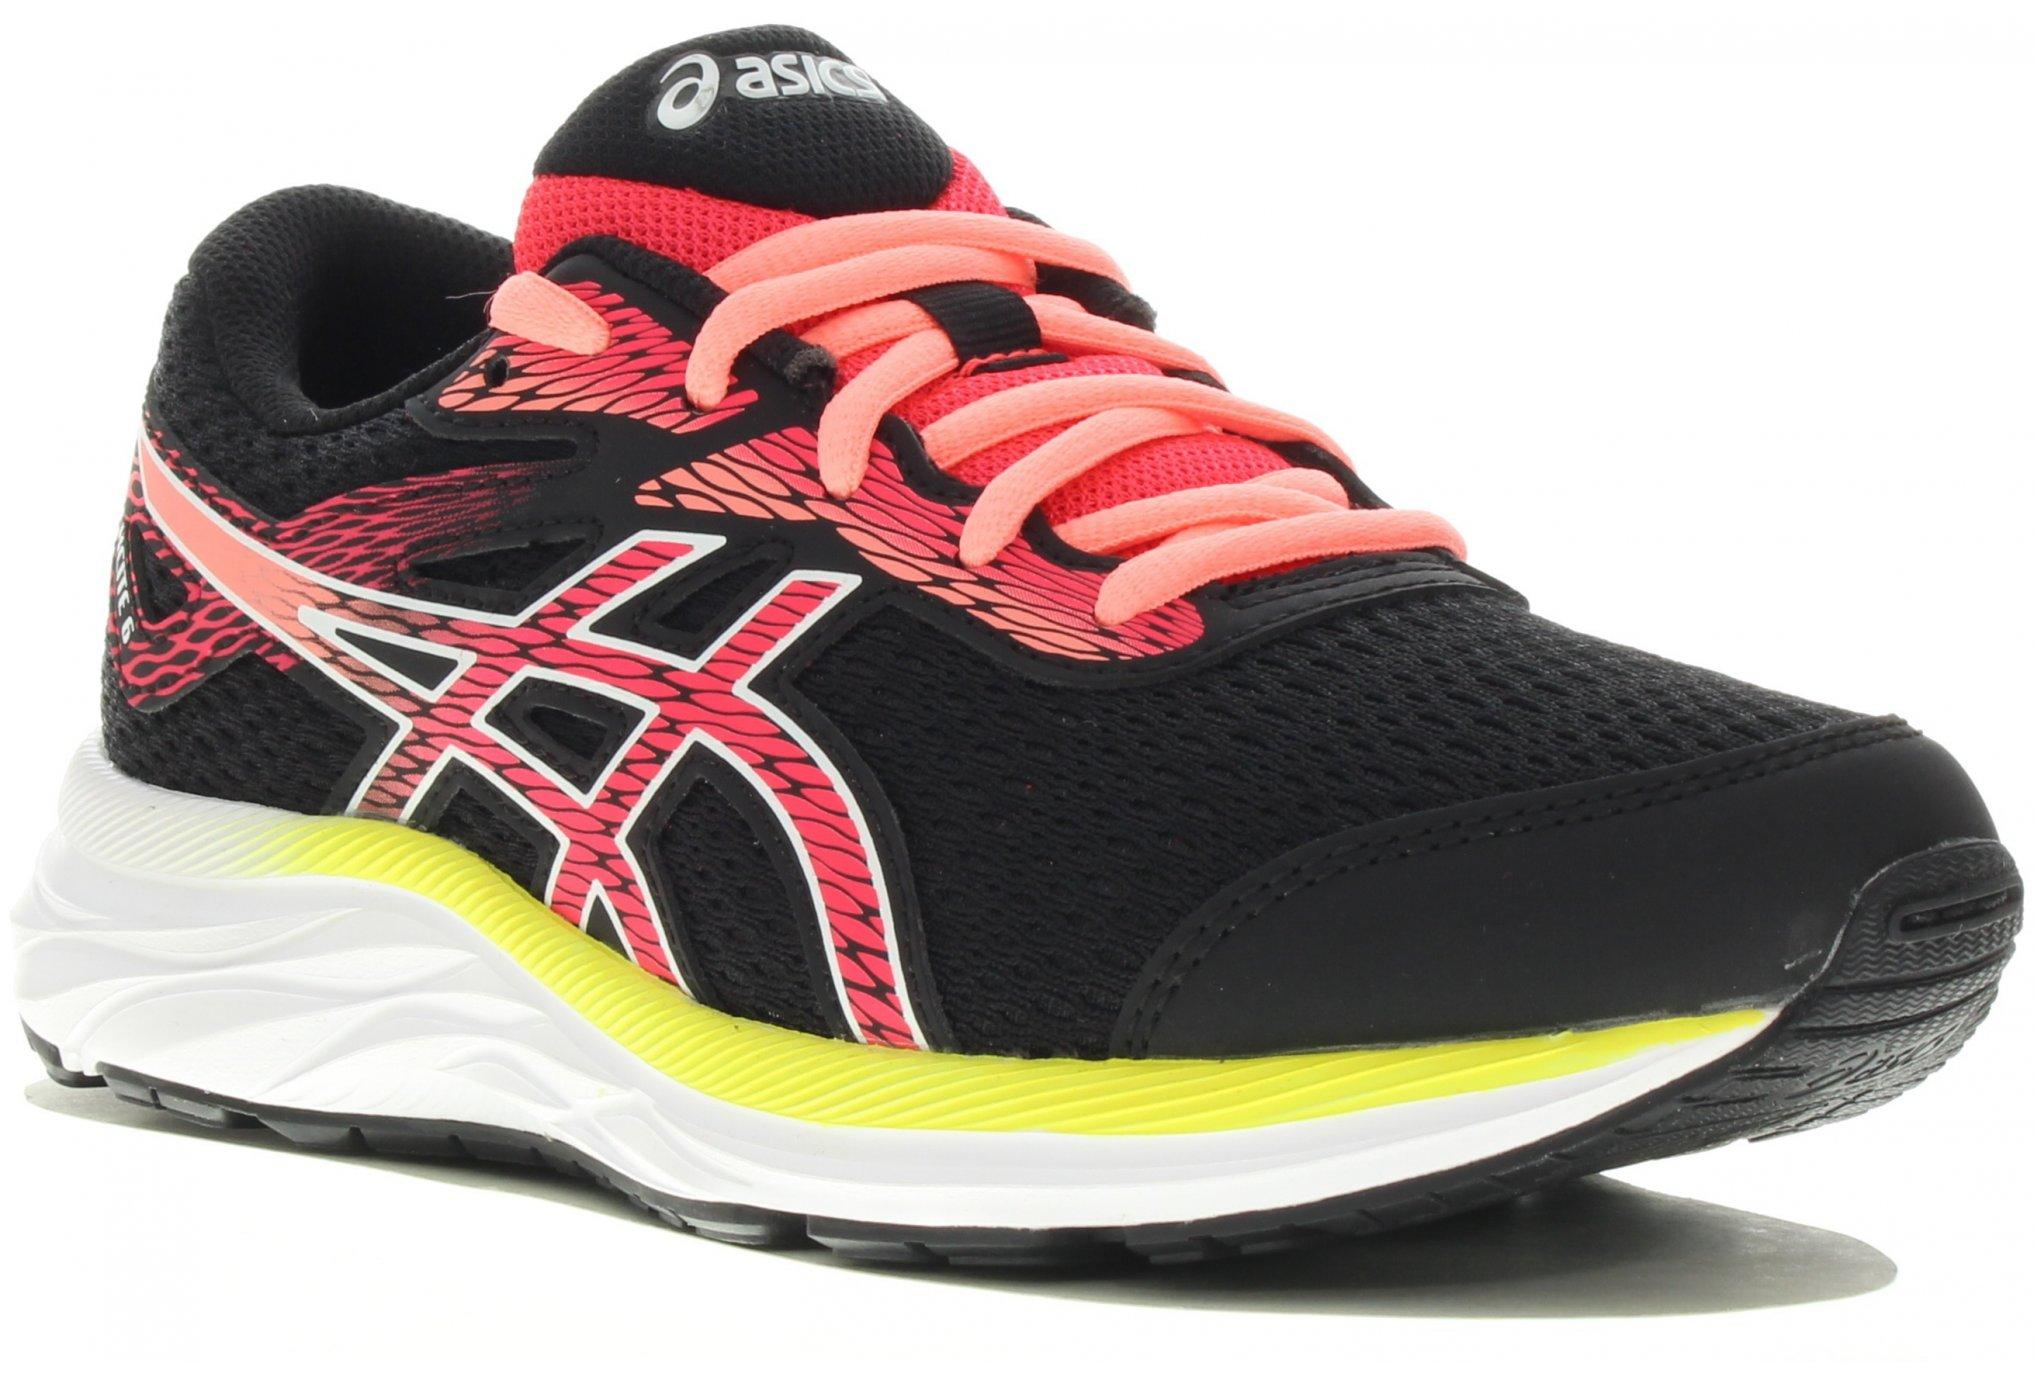 Asics Gel-Excite 6 Chaussures running femme